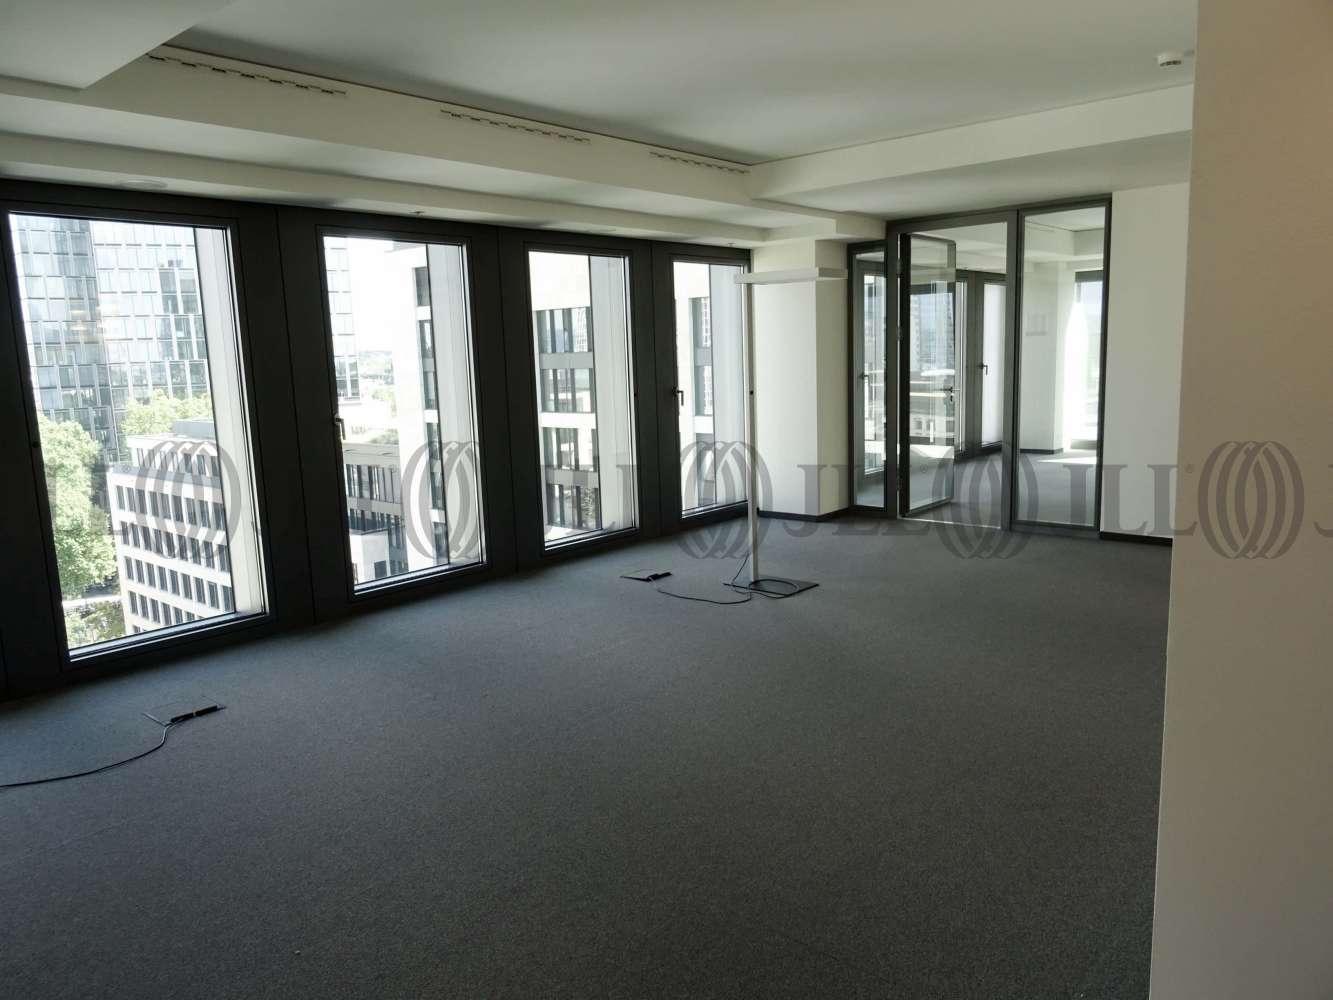 Büros Frankfurt am main, 60325 - Büro - Frankfurt am Main, Westend-Süd - F0995 - 10529999